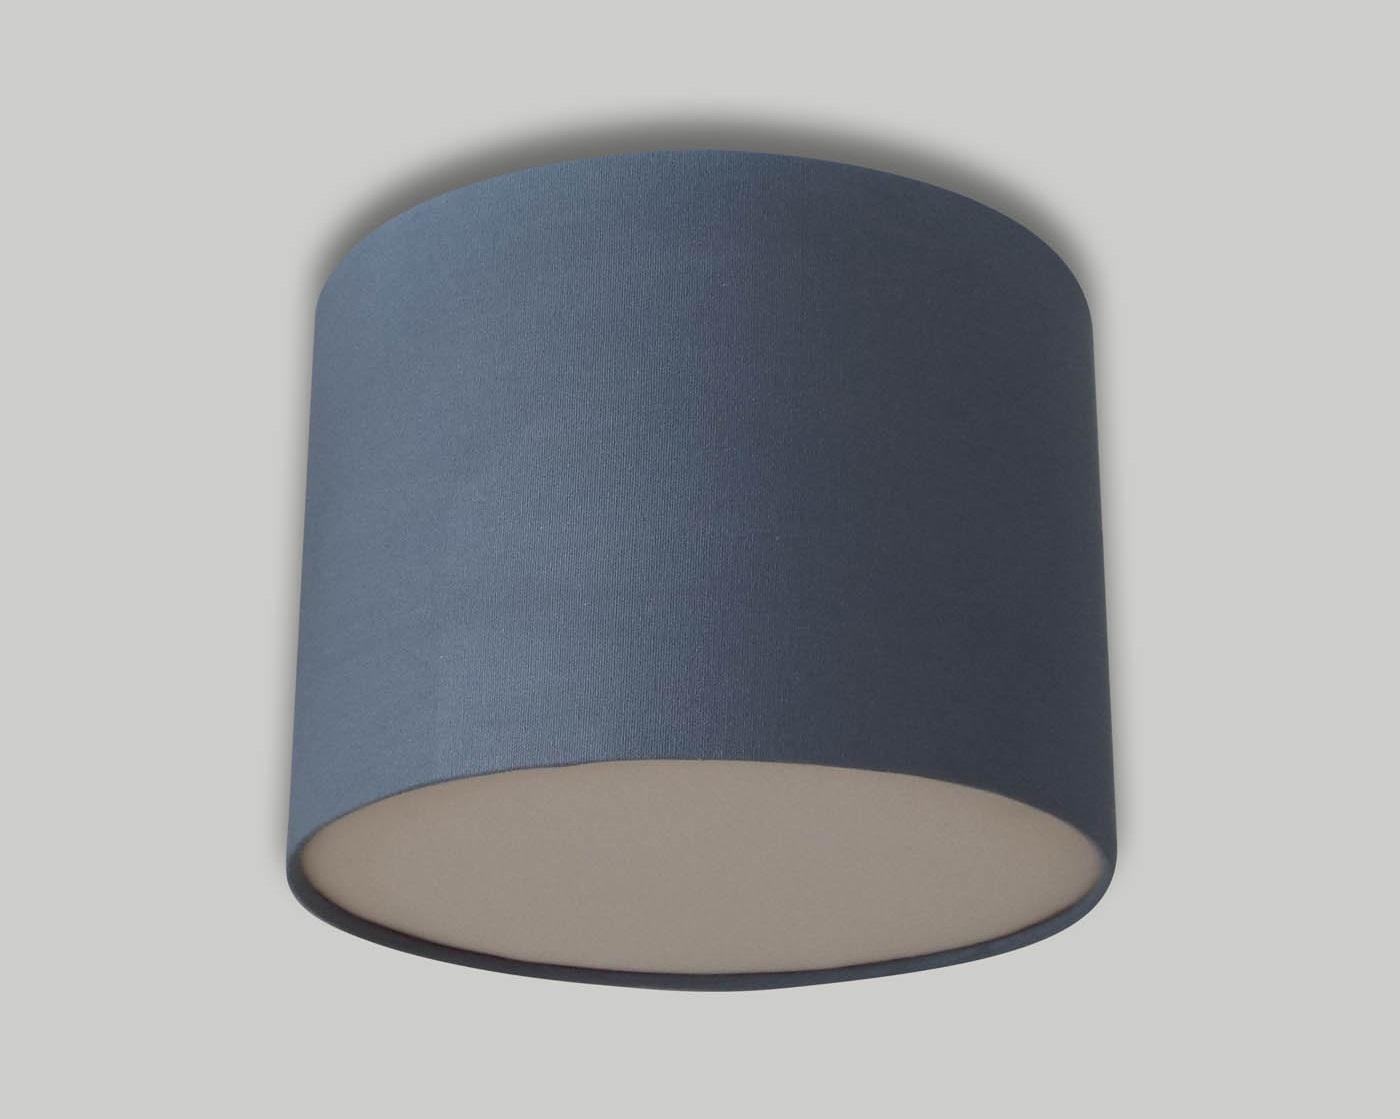 Dark grey ceiling drum lampshade light beige diffuser the dark grey ceiling drum lampshade light beige diffuser aloadofball Image collections